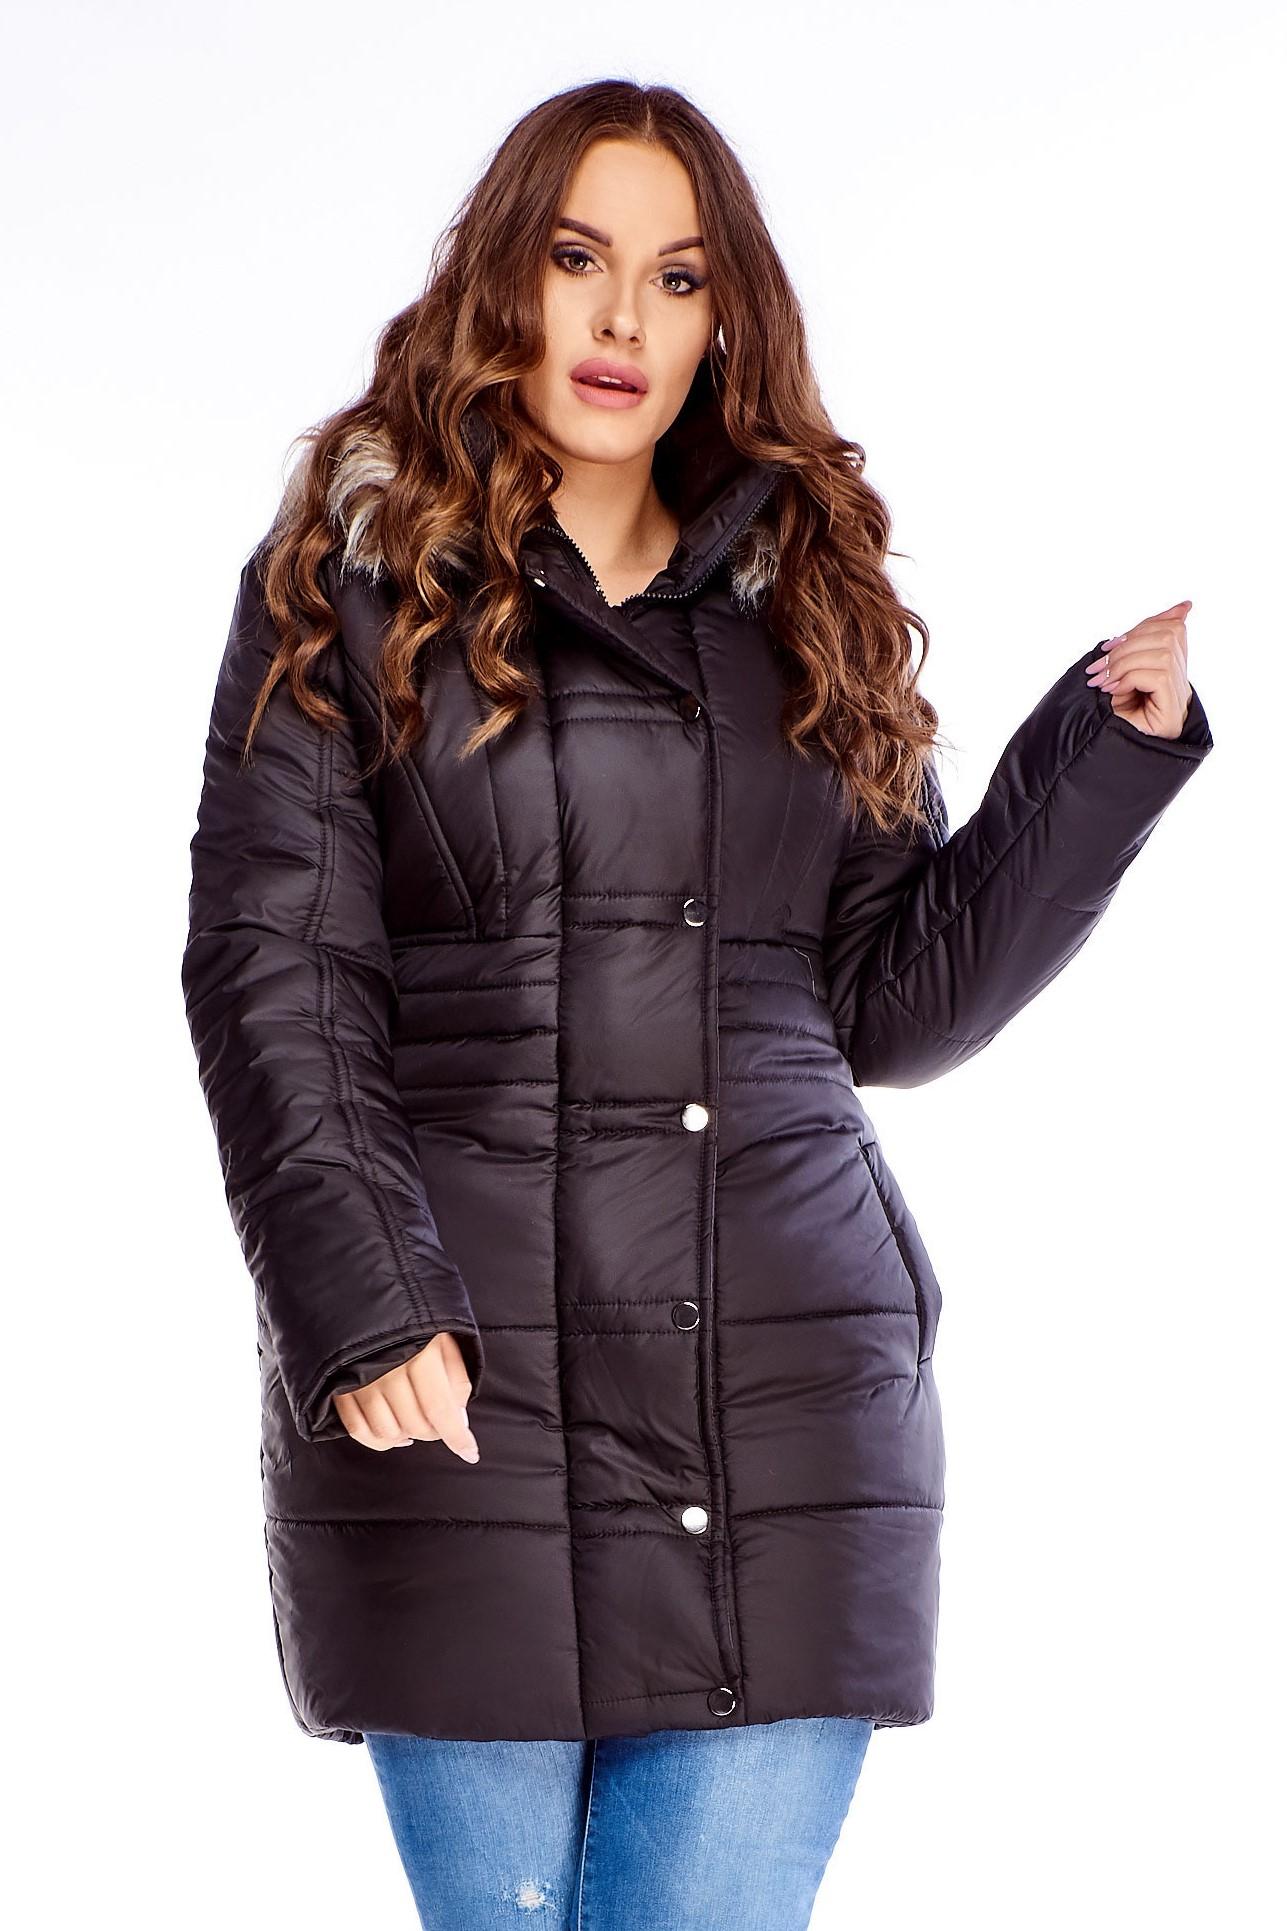 Dlhá dámska zimná bunda s kapucňou - 36